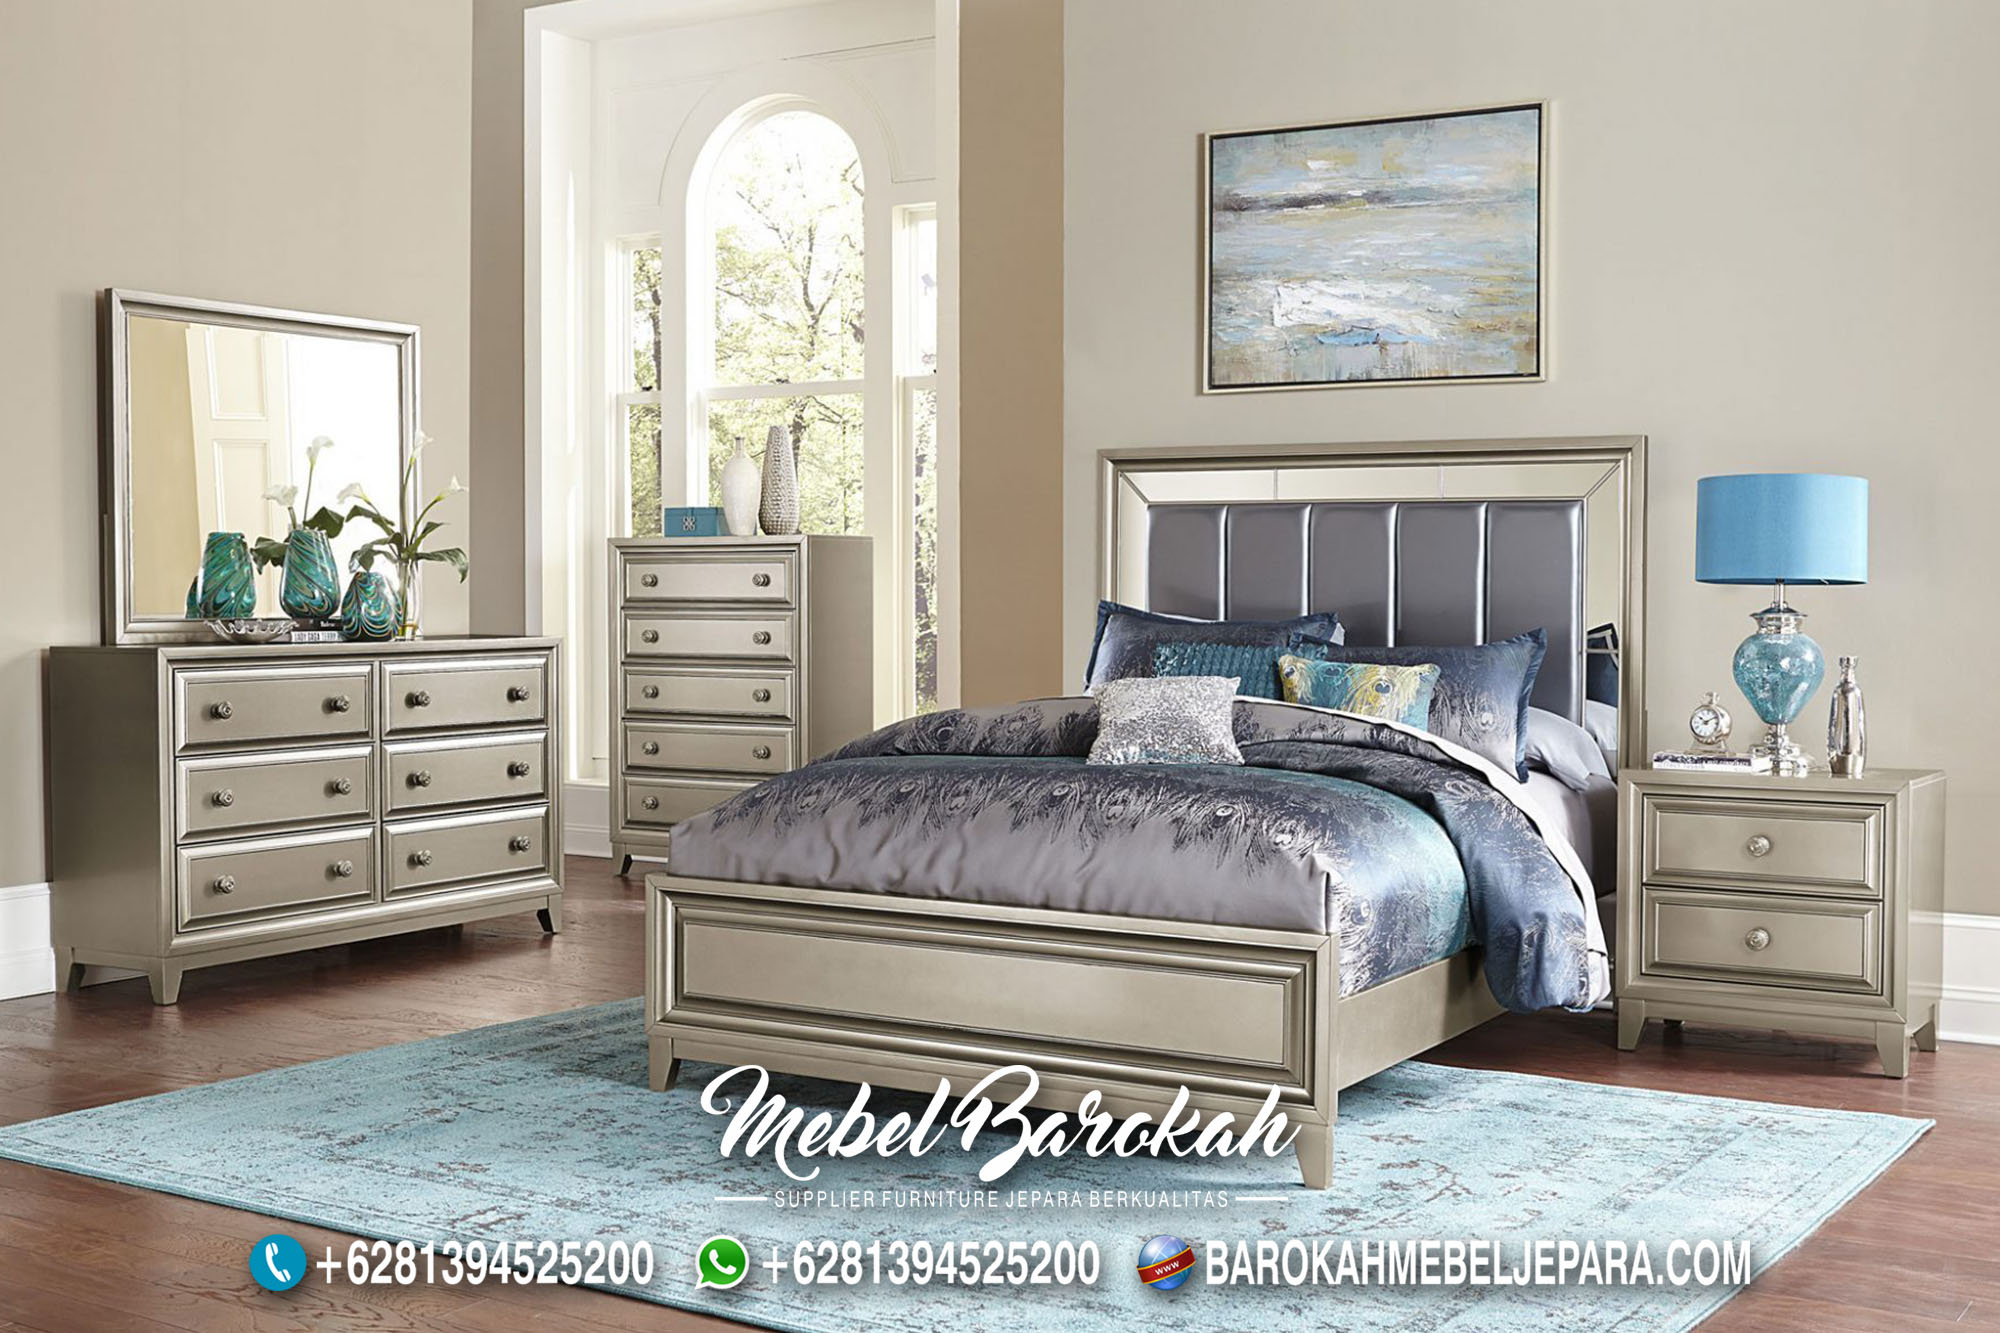 Desain Interior Minimalis Kamar Tidur MB-636